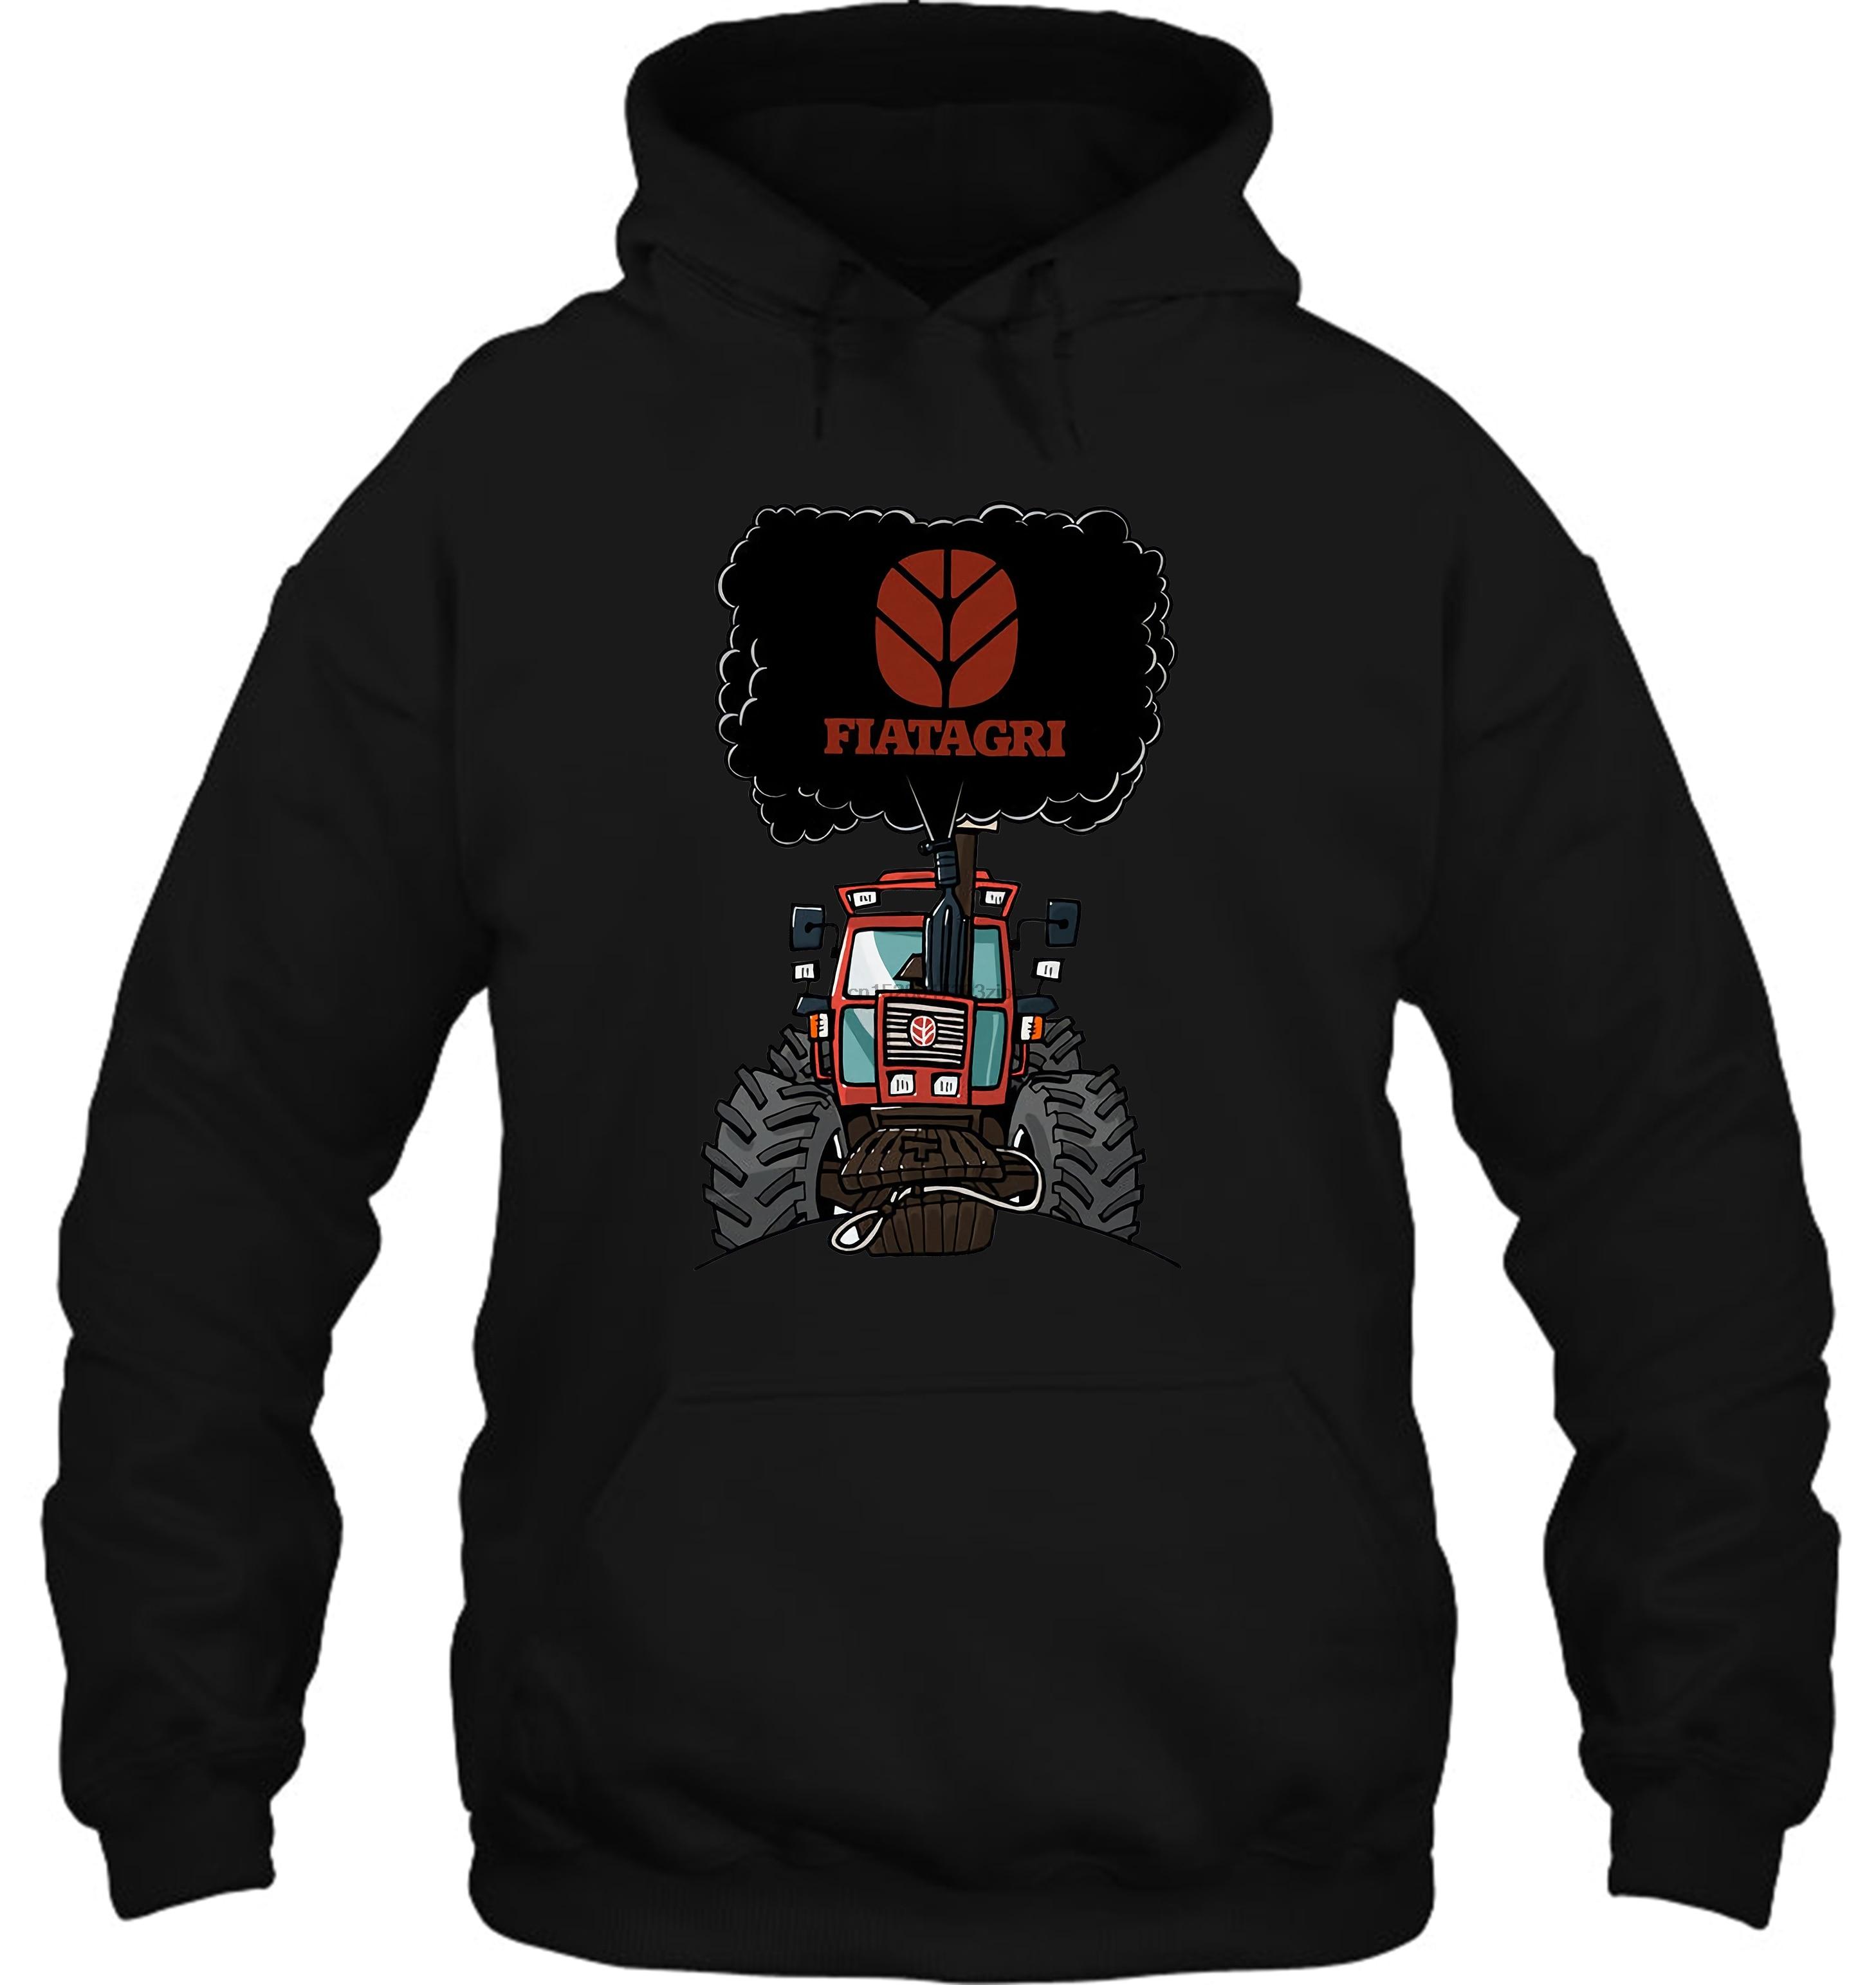 Fiatagri Tractor Men's Streetwear Men Women Hoodies Sweatshirts